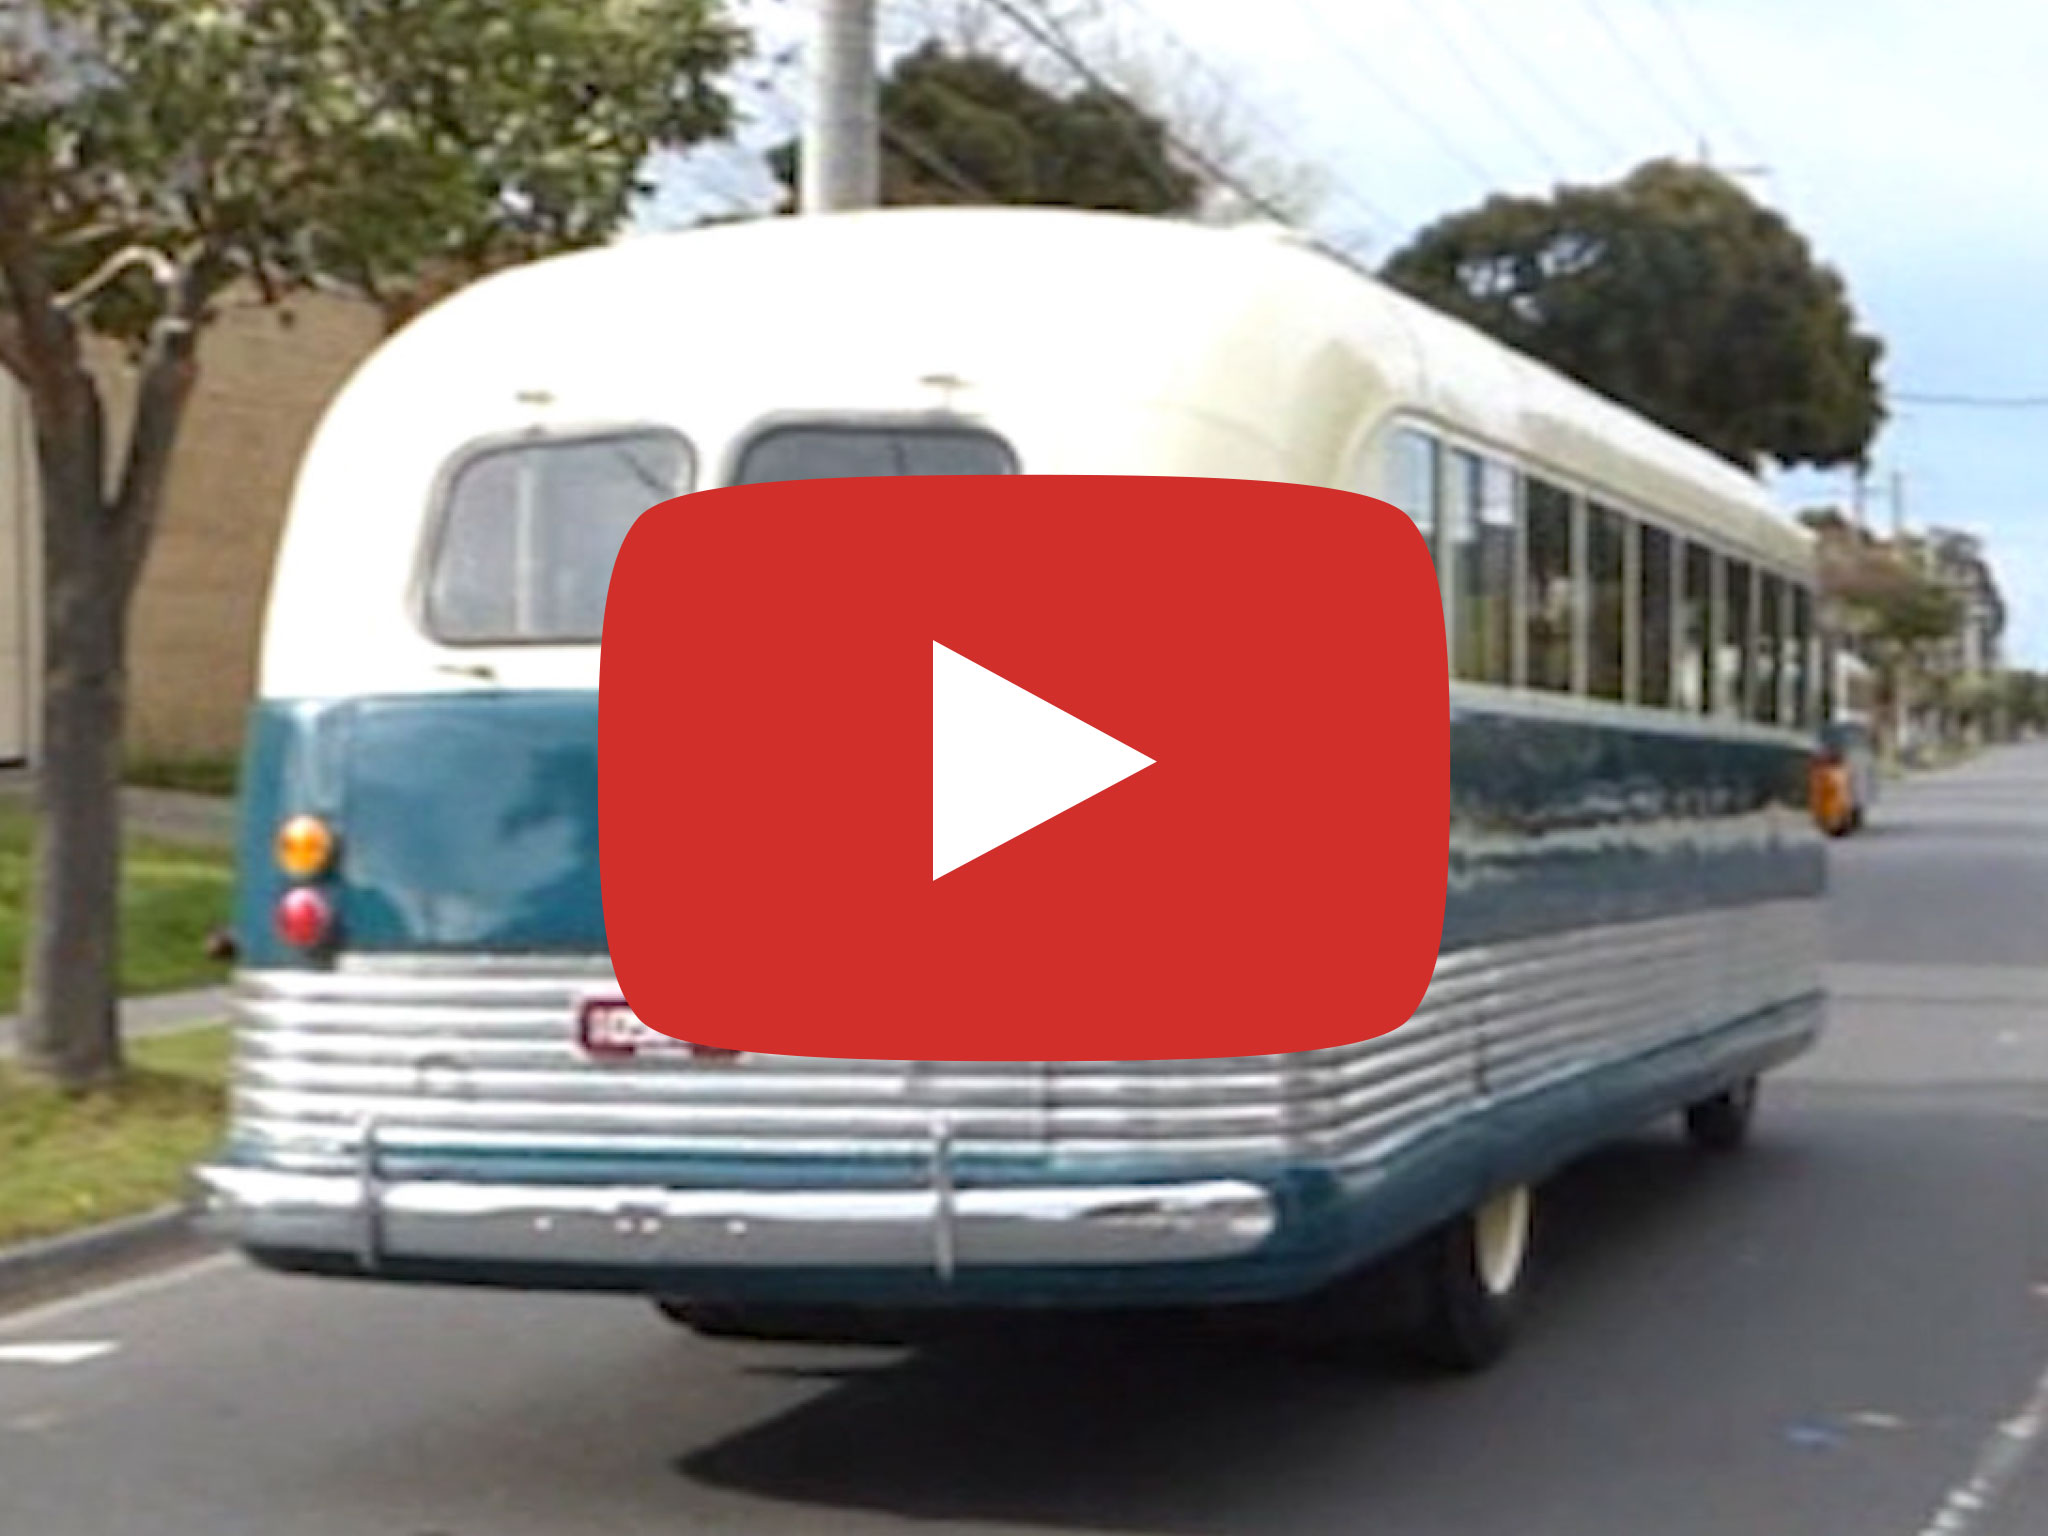 Bedford OB bus (1948 model), Mt Waverley VIC. Video by David Kemp in 2015